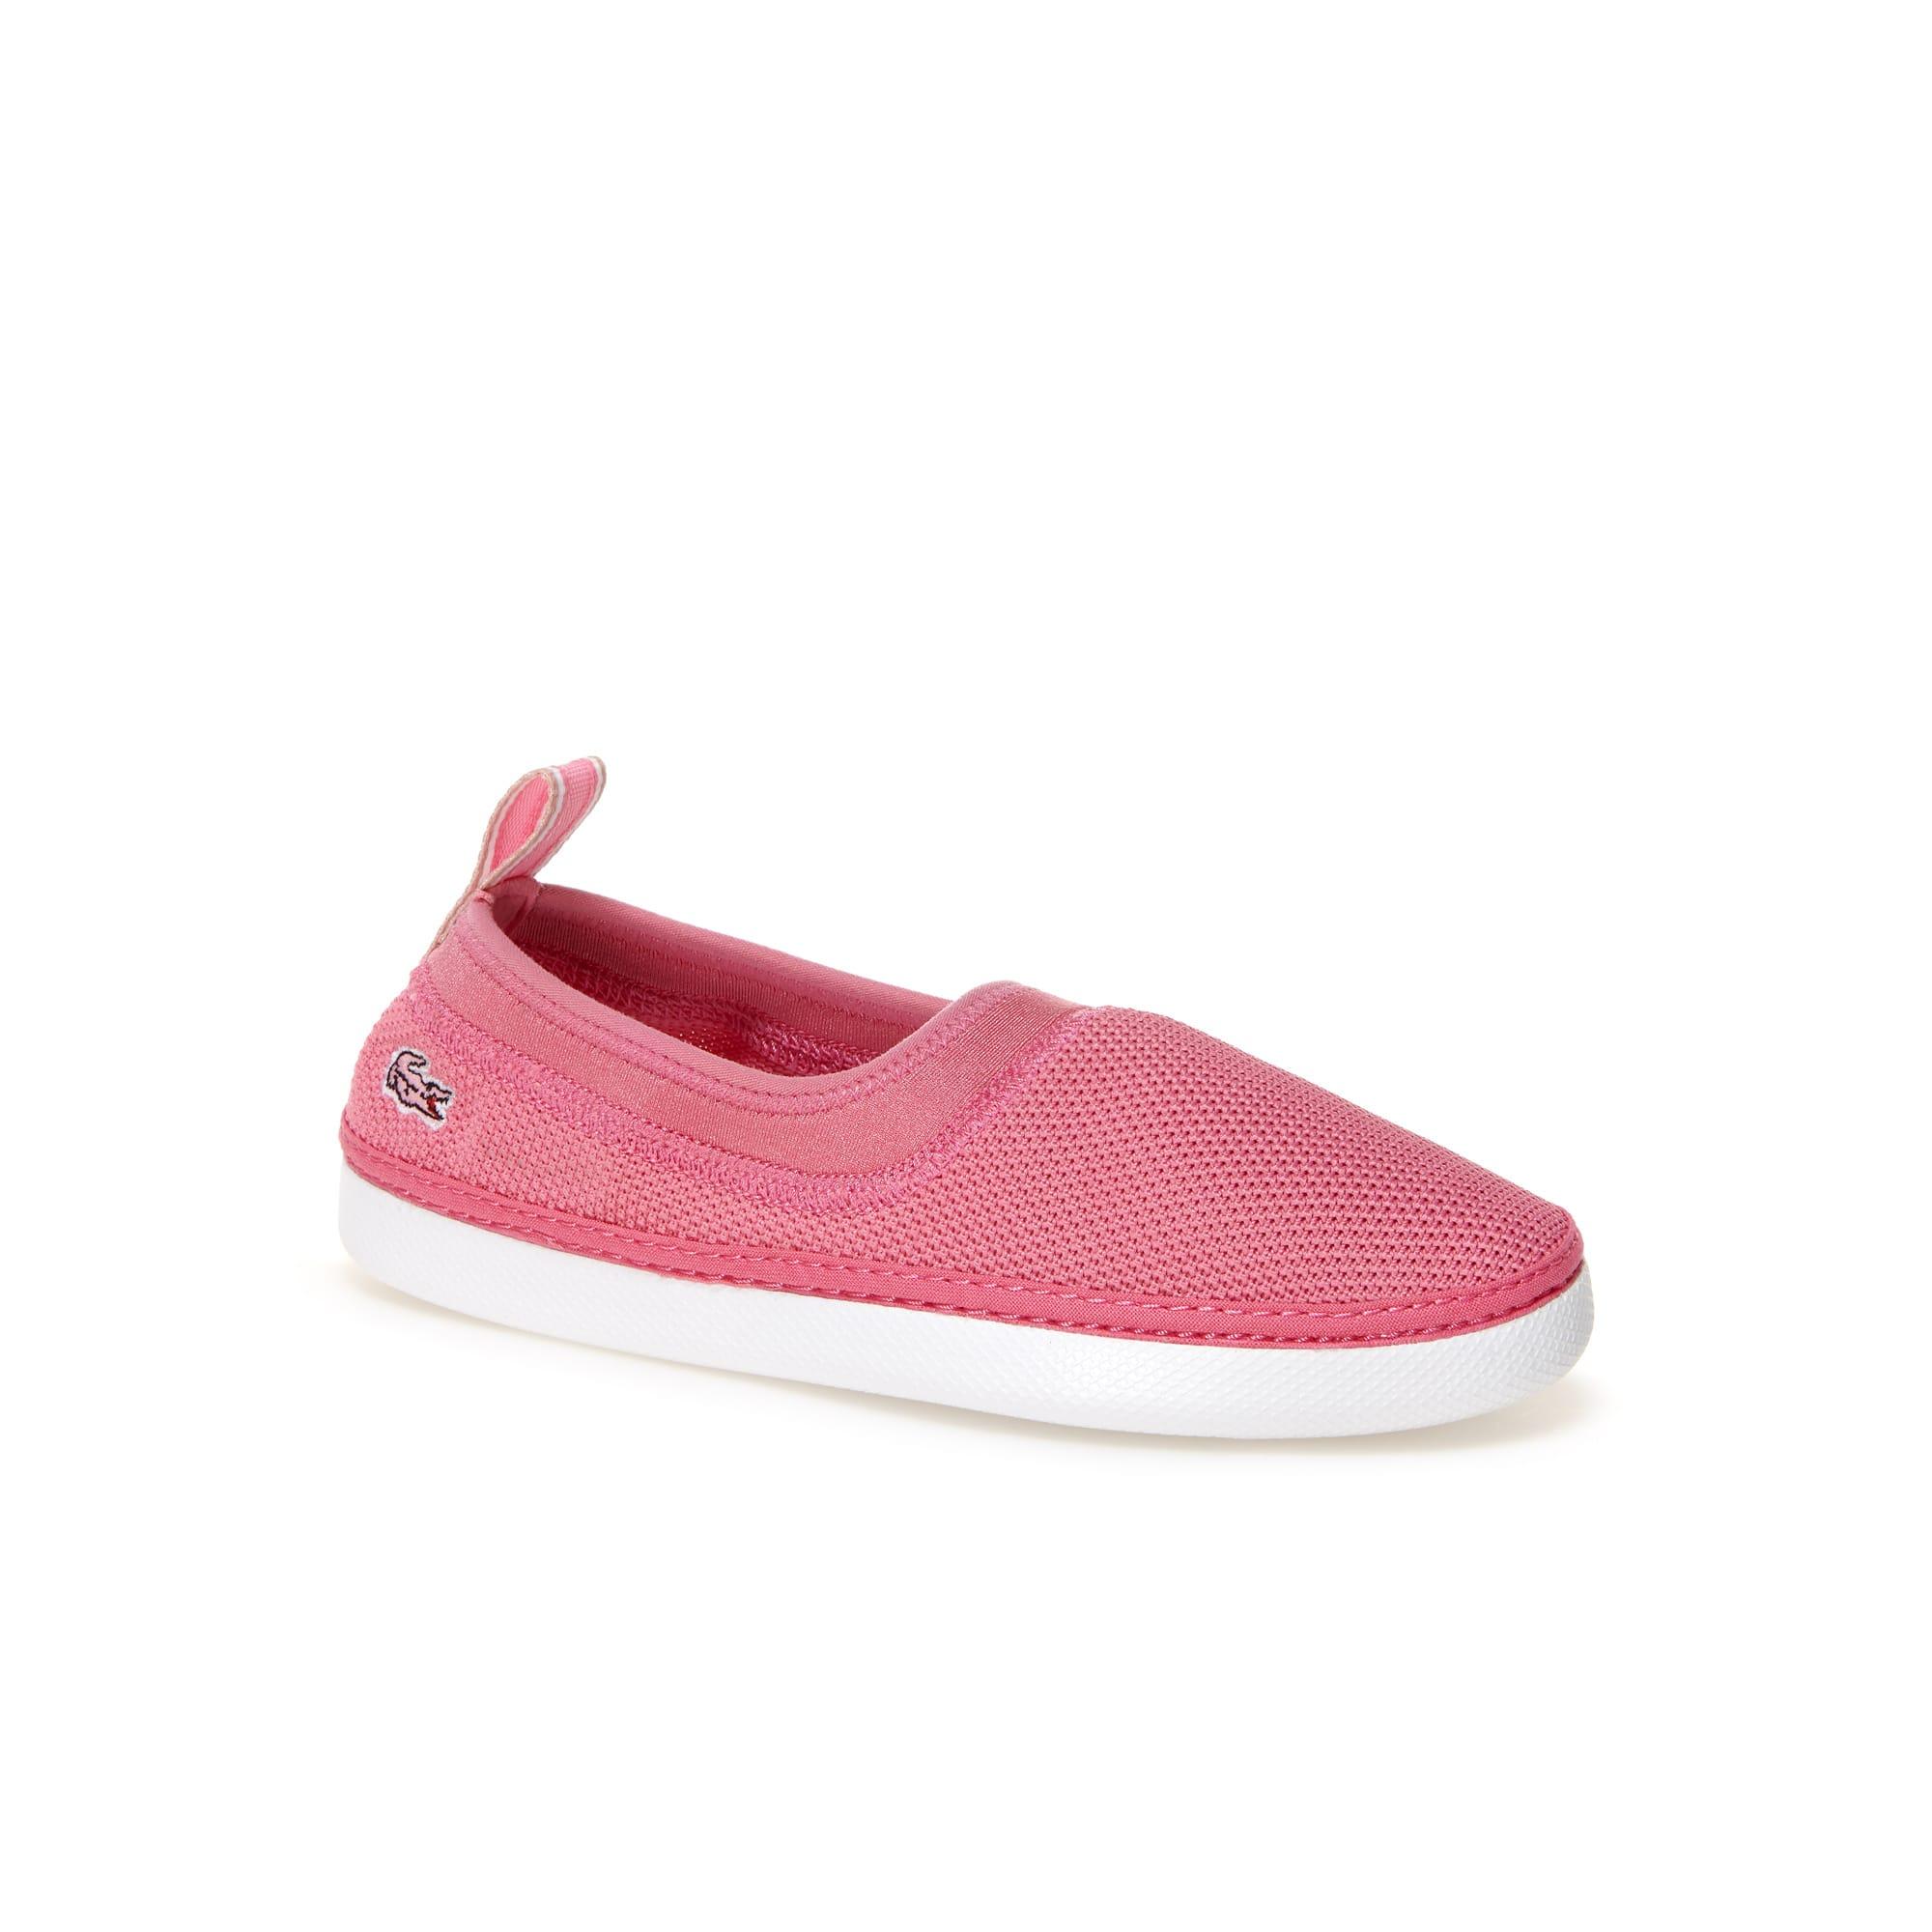 Sneakers senza stringhe L.ydro bambini in tessuto